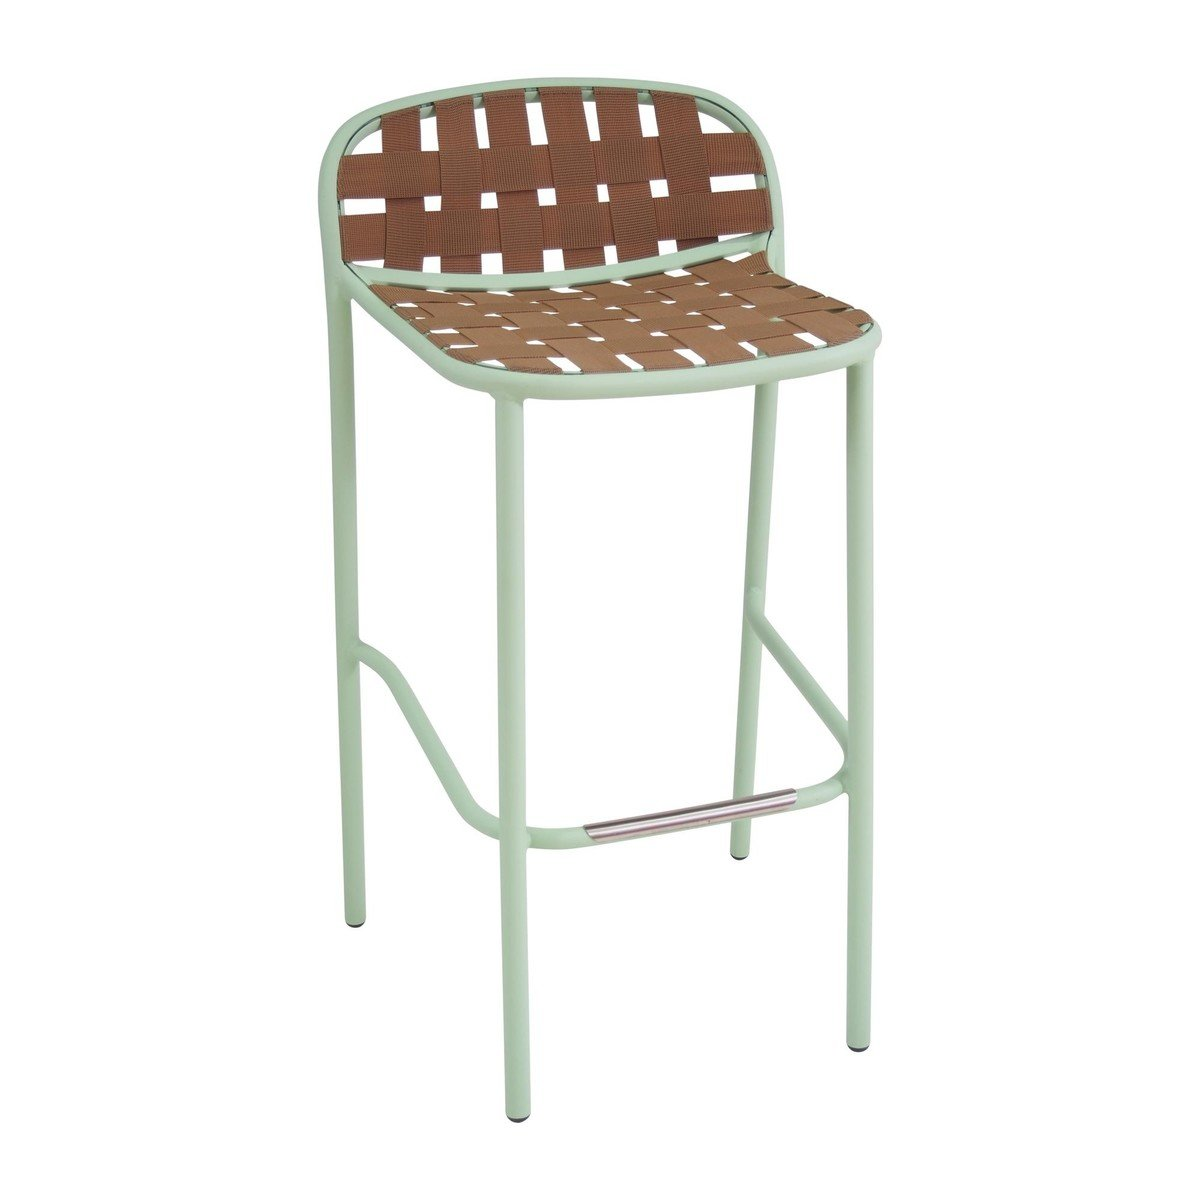 yard outdoor bar stool emu ambientedirect com